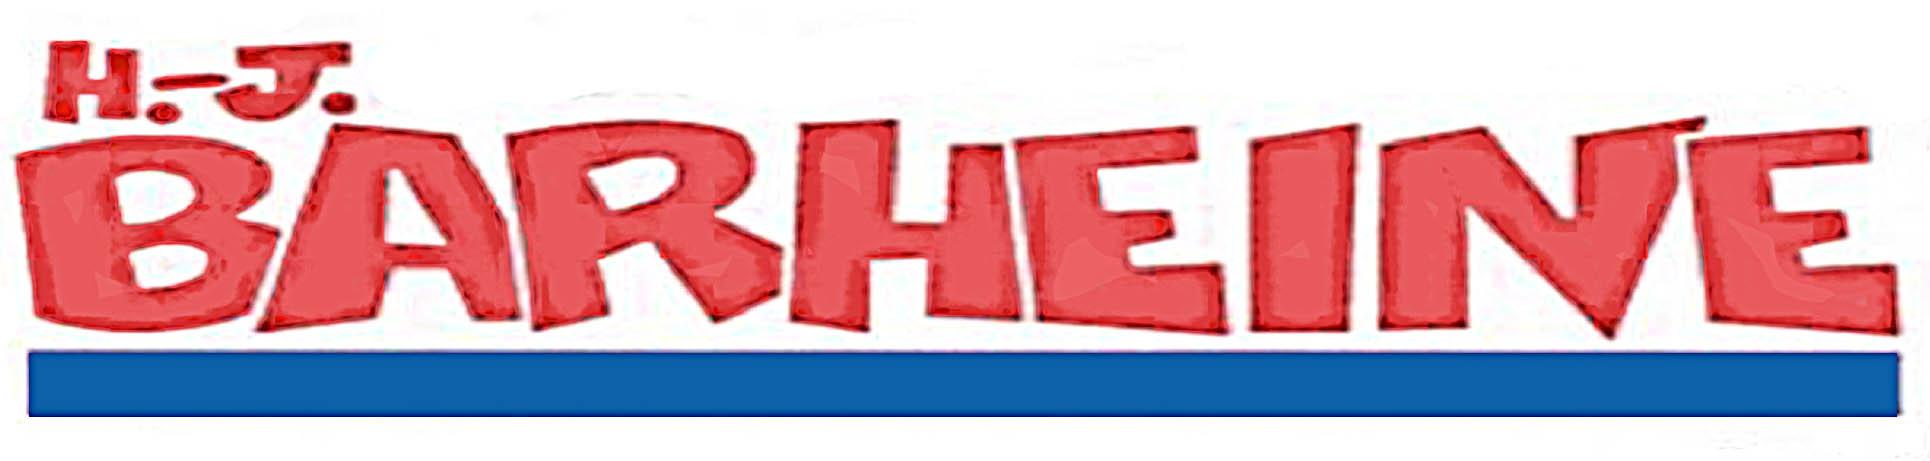 H.-J. Barheine GmbH & Co.KG